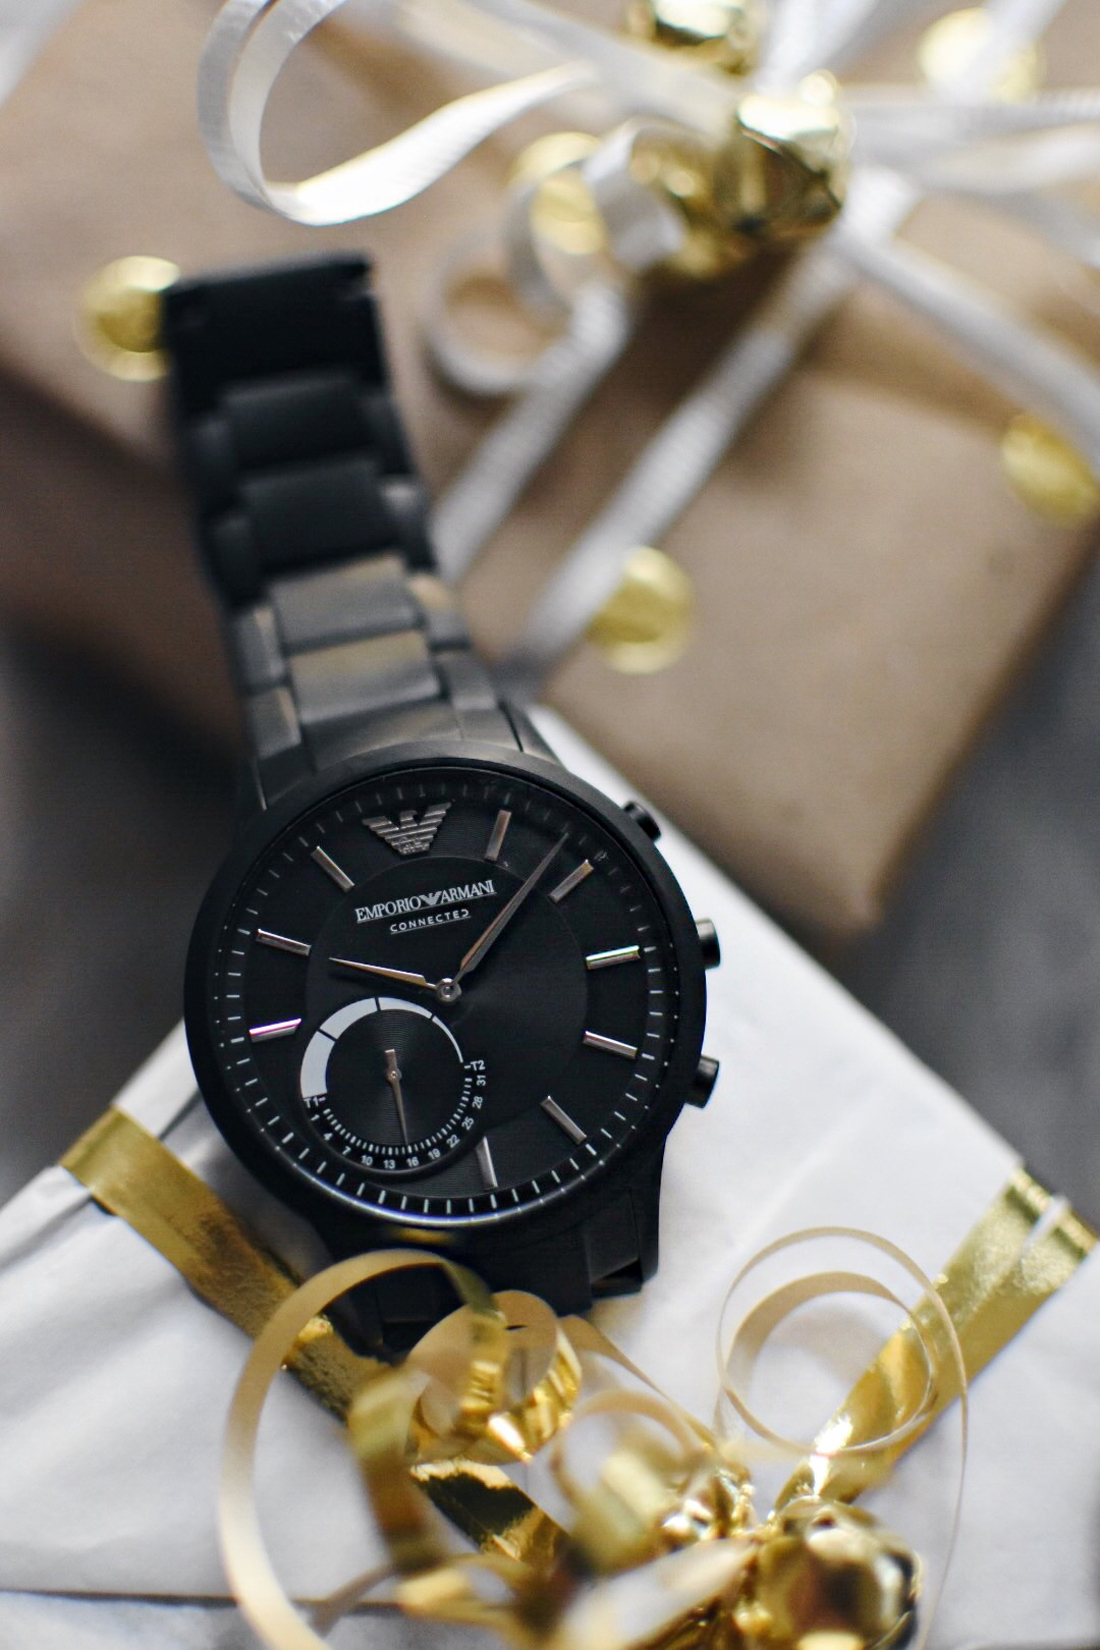 Emporio Armani hybrid watch